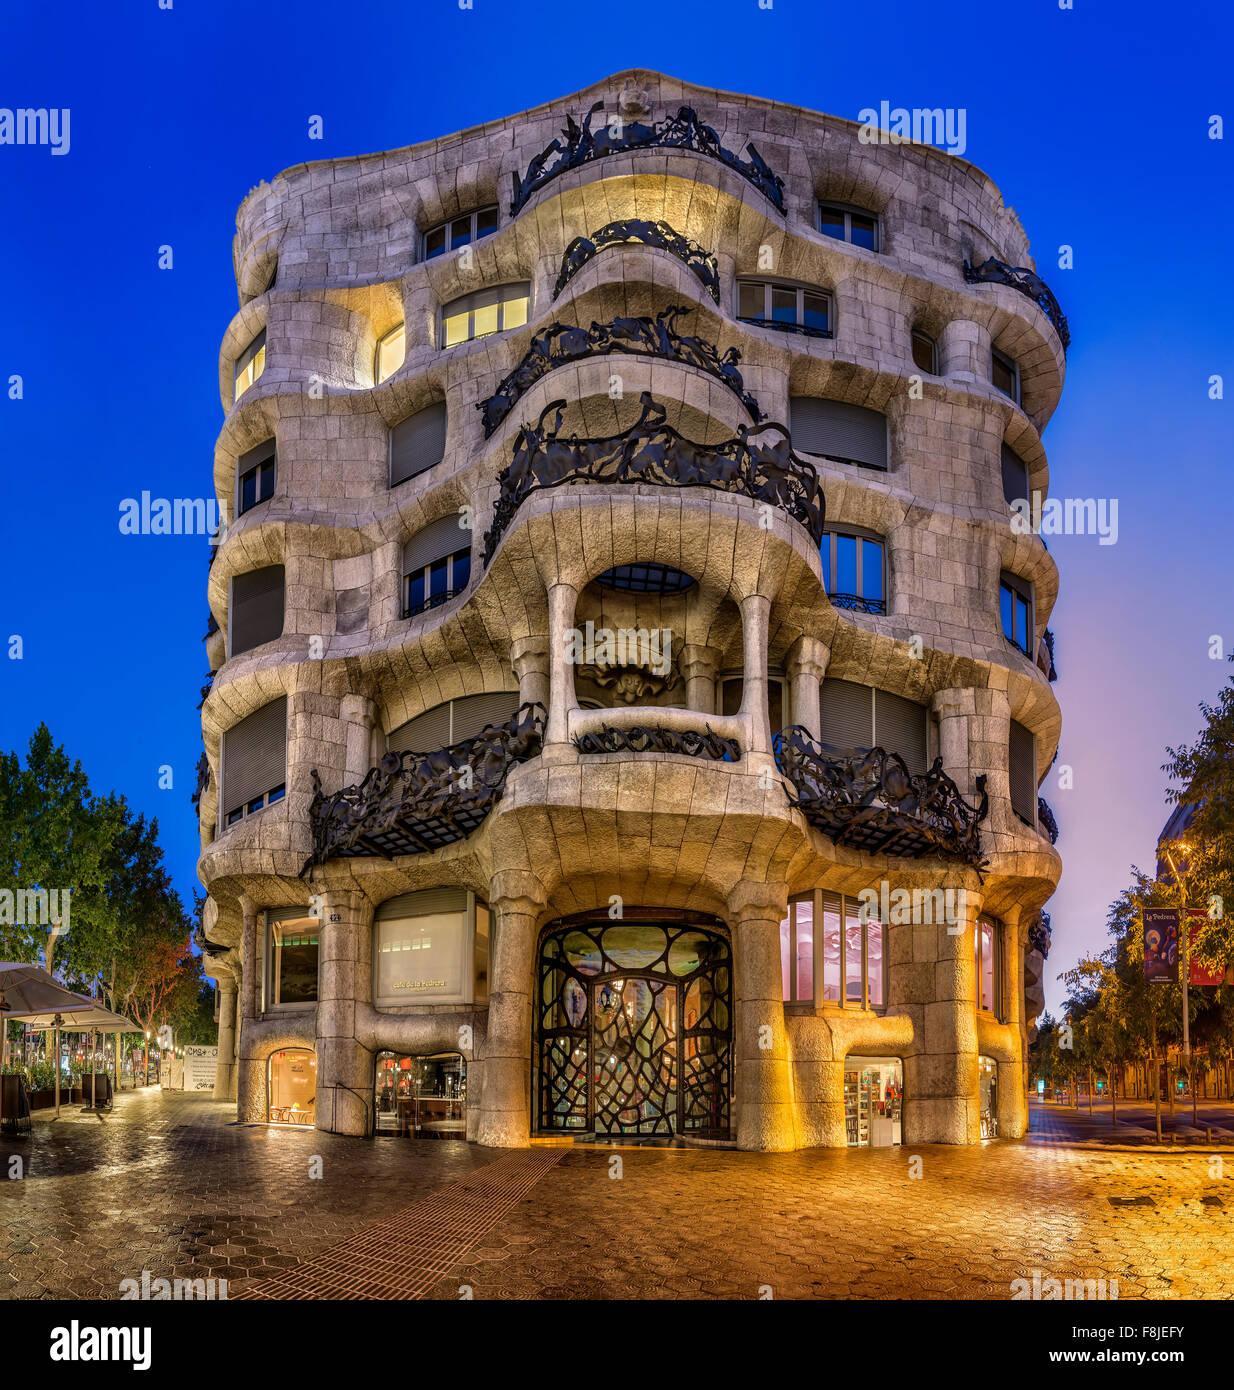 Casa Mila, Architect Antonio Gaudi, Barcelona, Catalonia, Spain - Stock Image